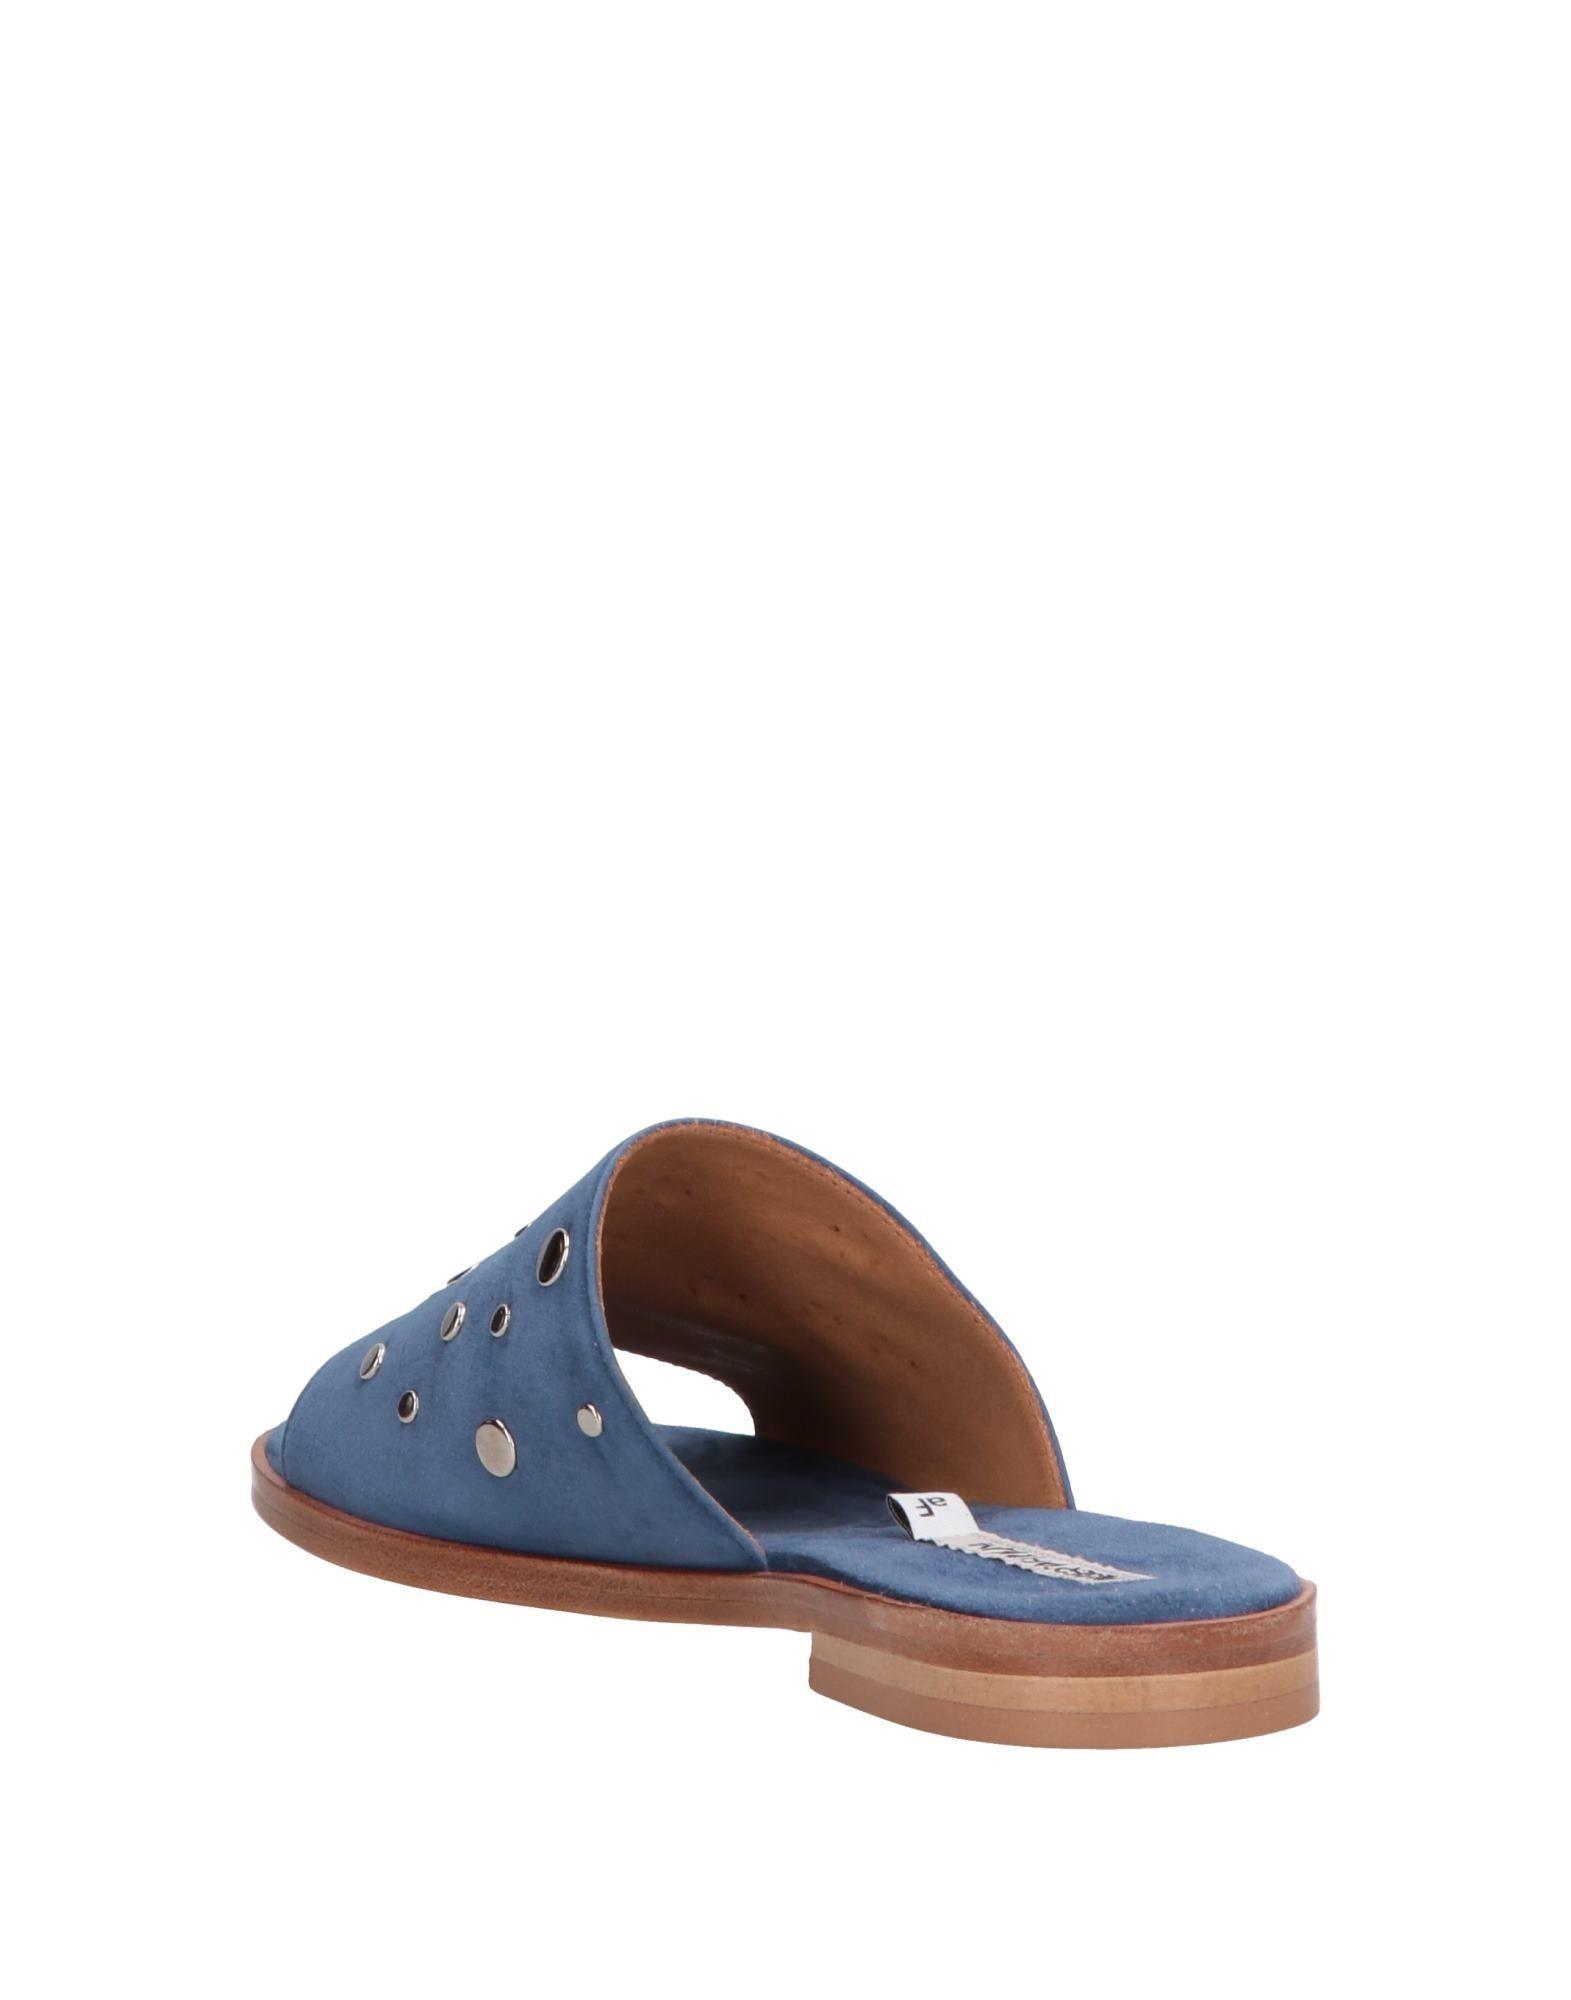 Sandalias Alberto Fermani de Cuero de color Azul